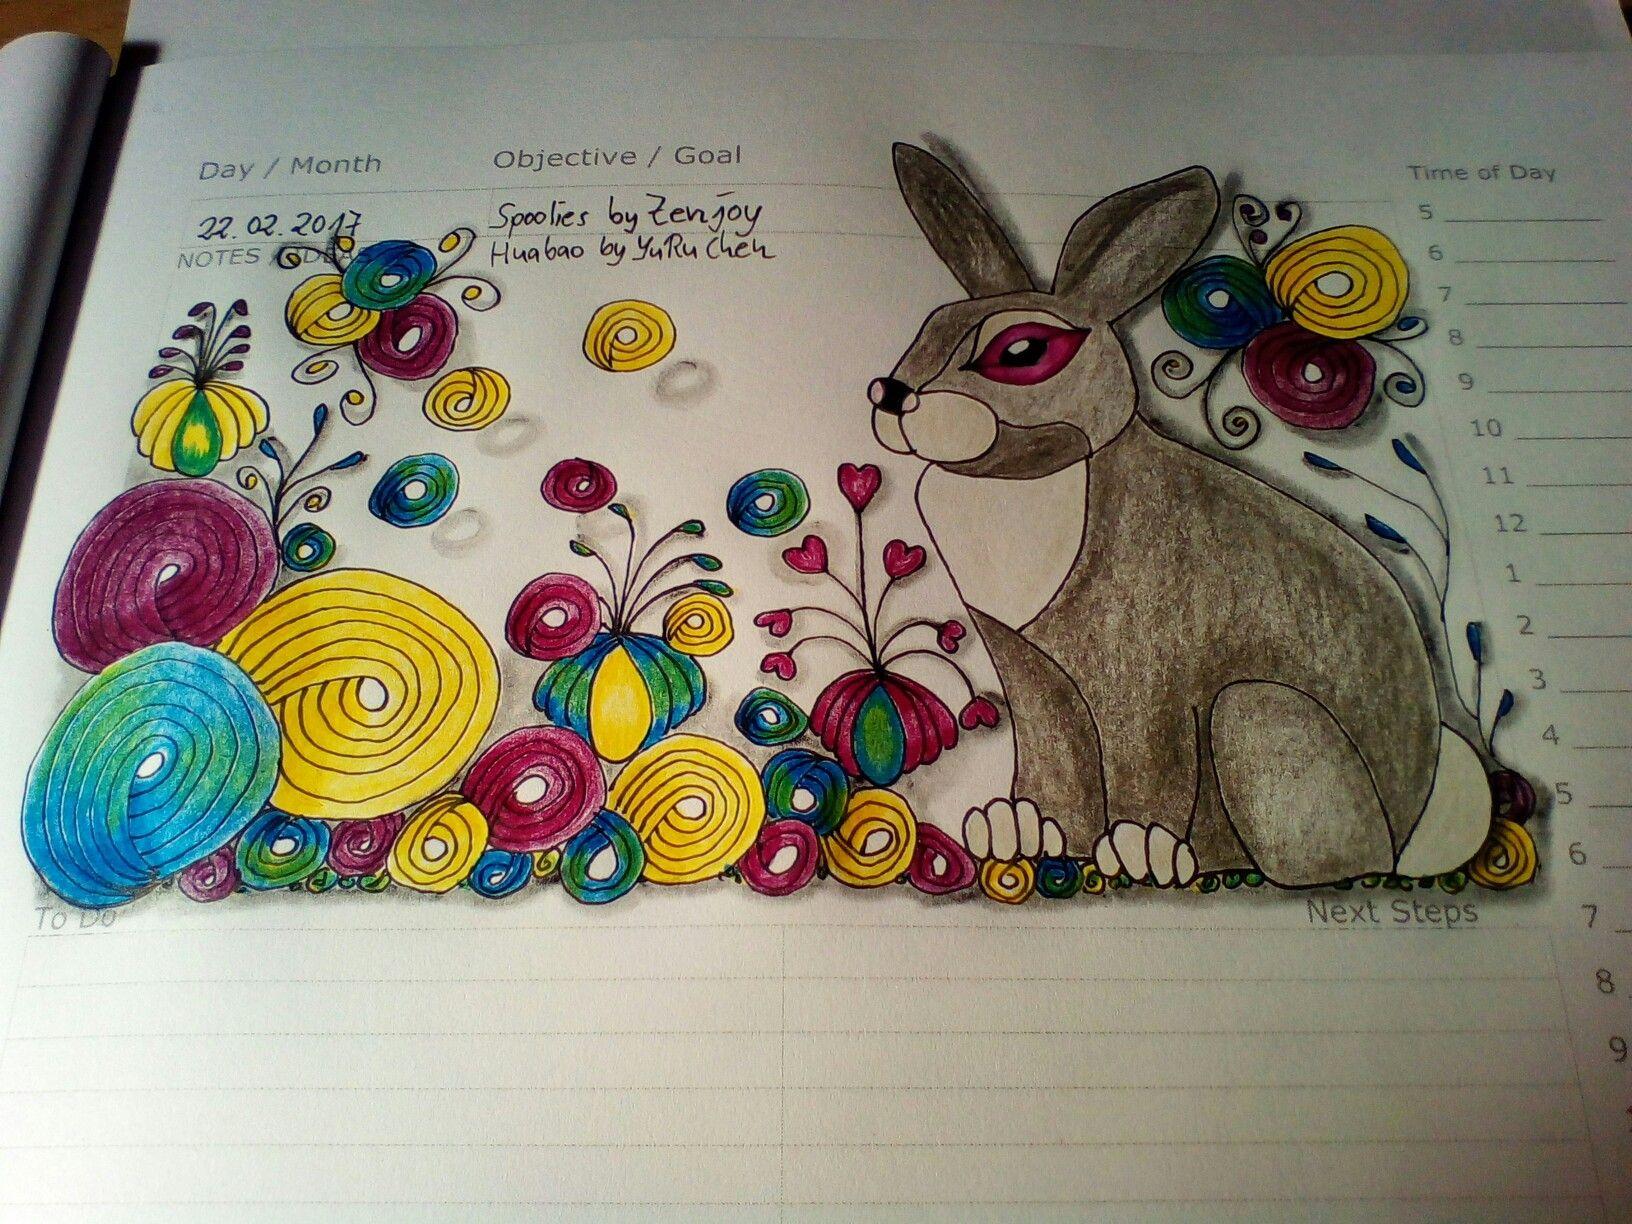 Spoolies mit Huabao 💗💗💗 Ostern rückt näher 😂😂😂